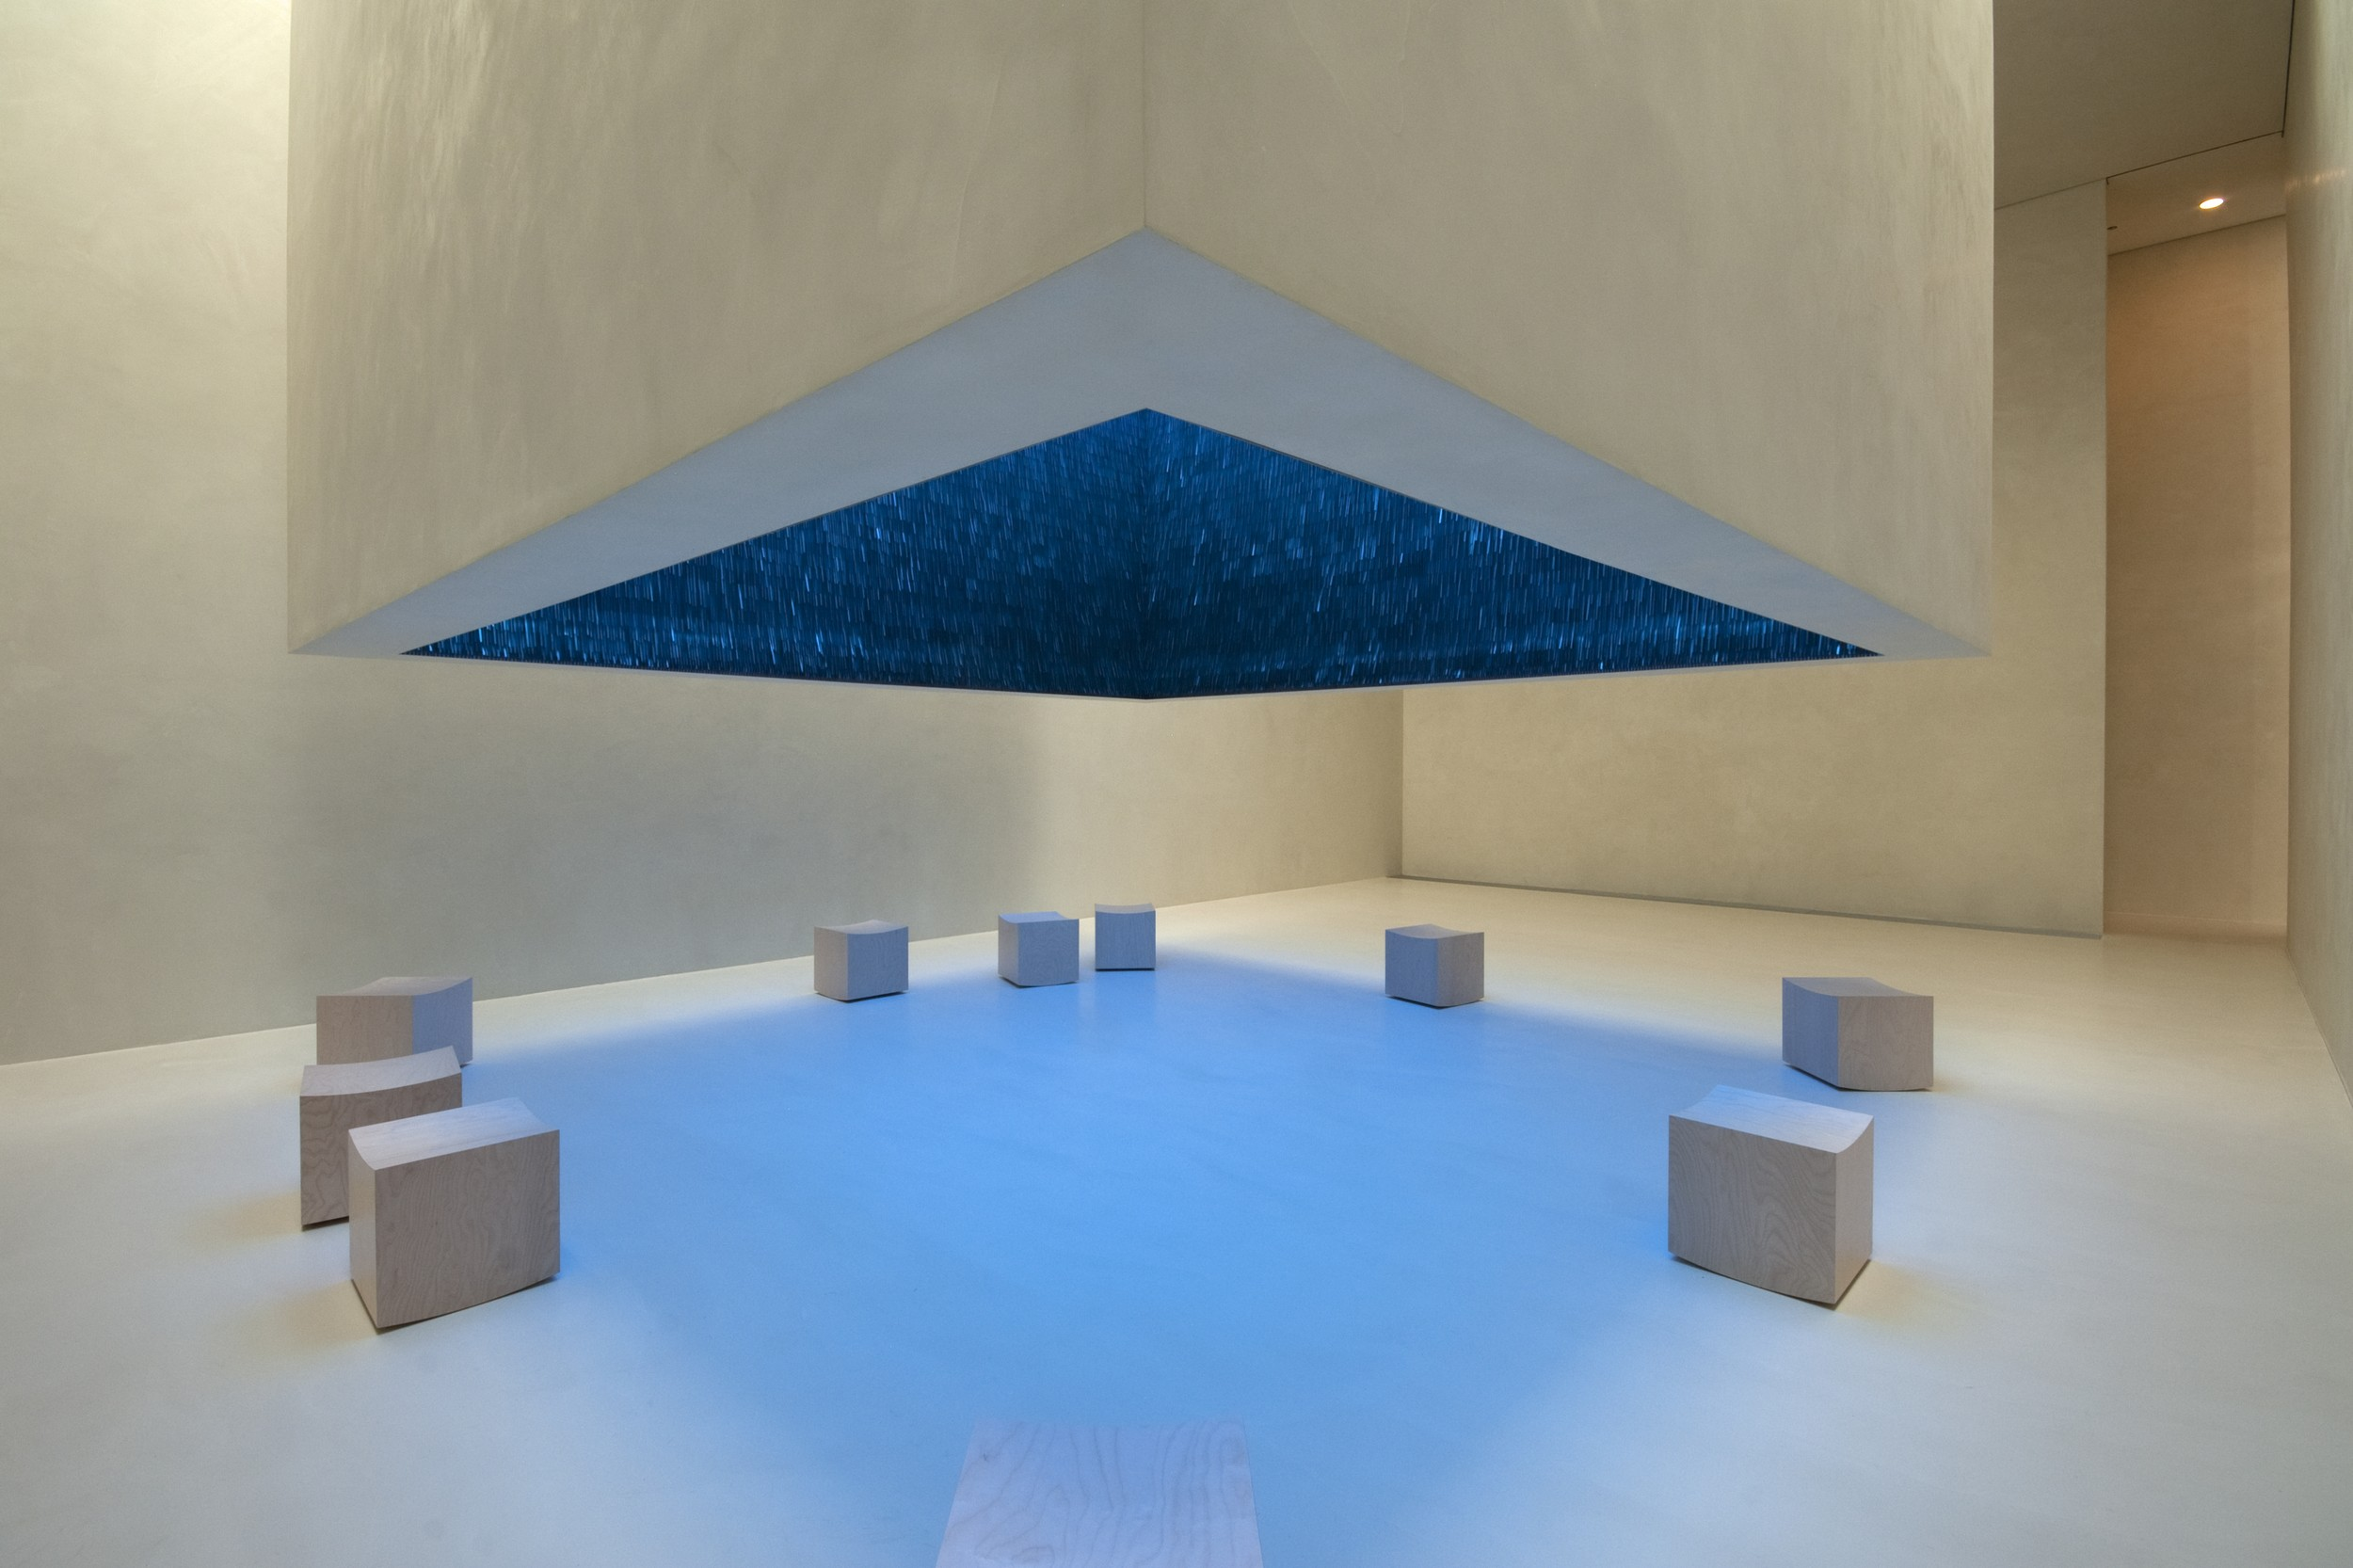 Silence Room - ThyssenKrupp Headquaters